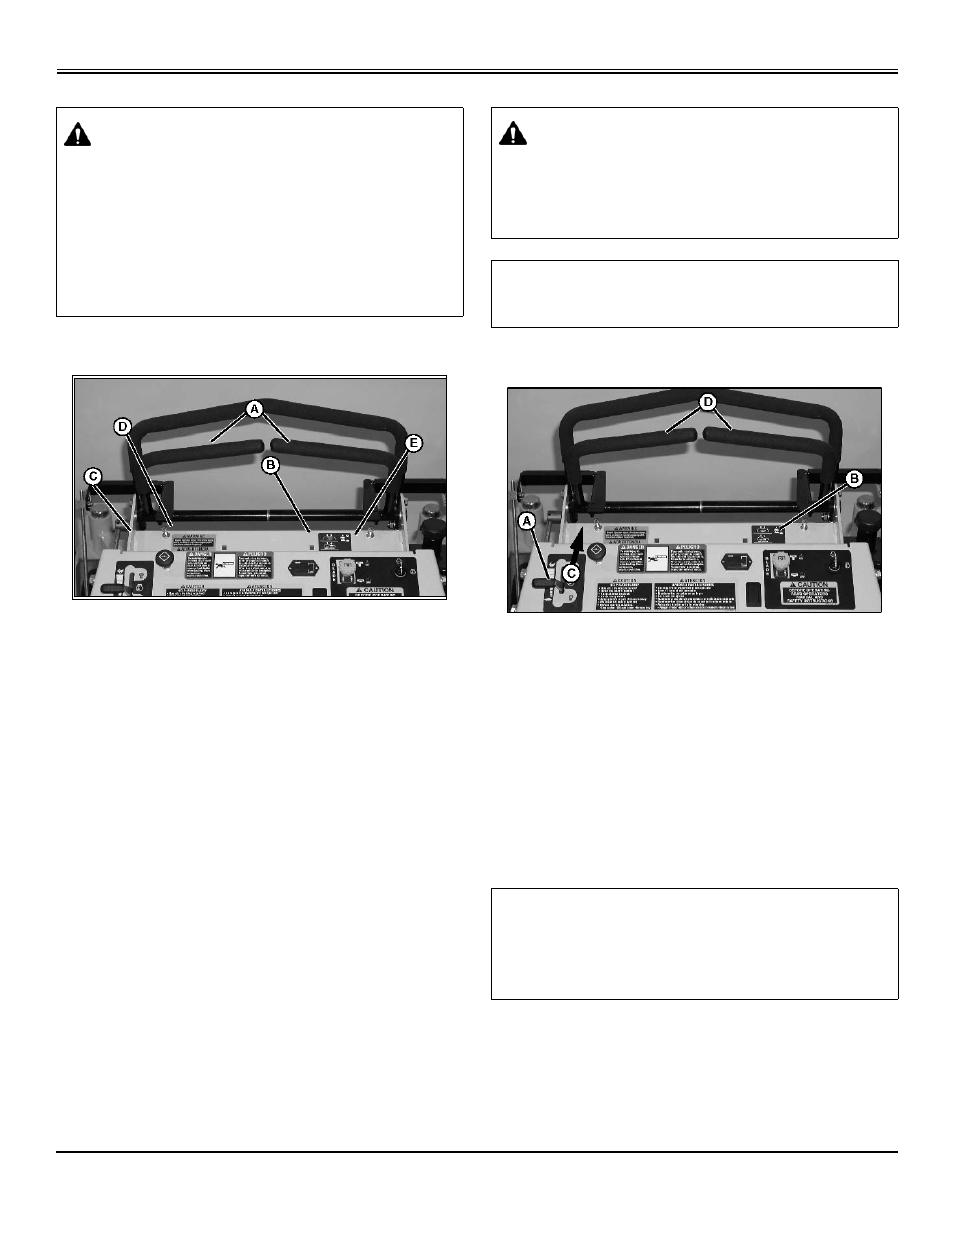 great dane super surfer series ii gskh2561s page17 wiring diagram super surfer kawasaki 22khe trusted wiring diagrams